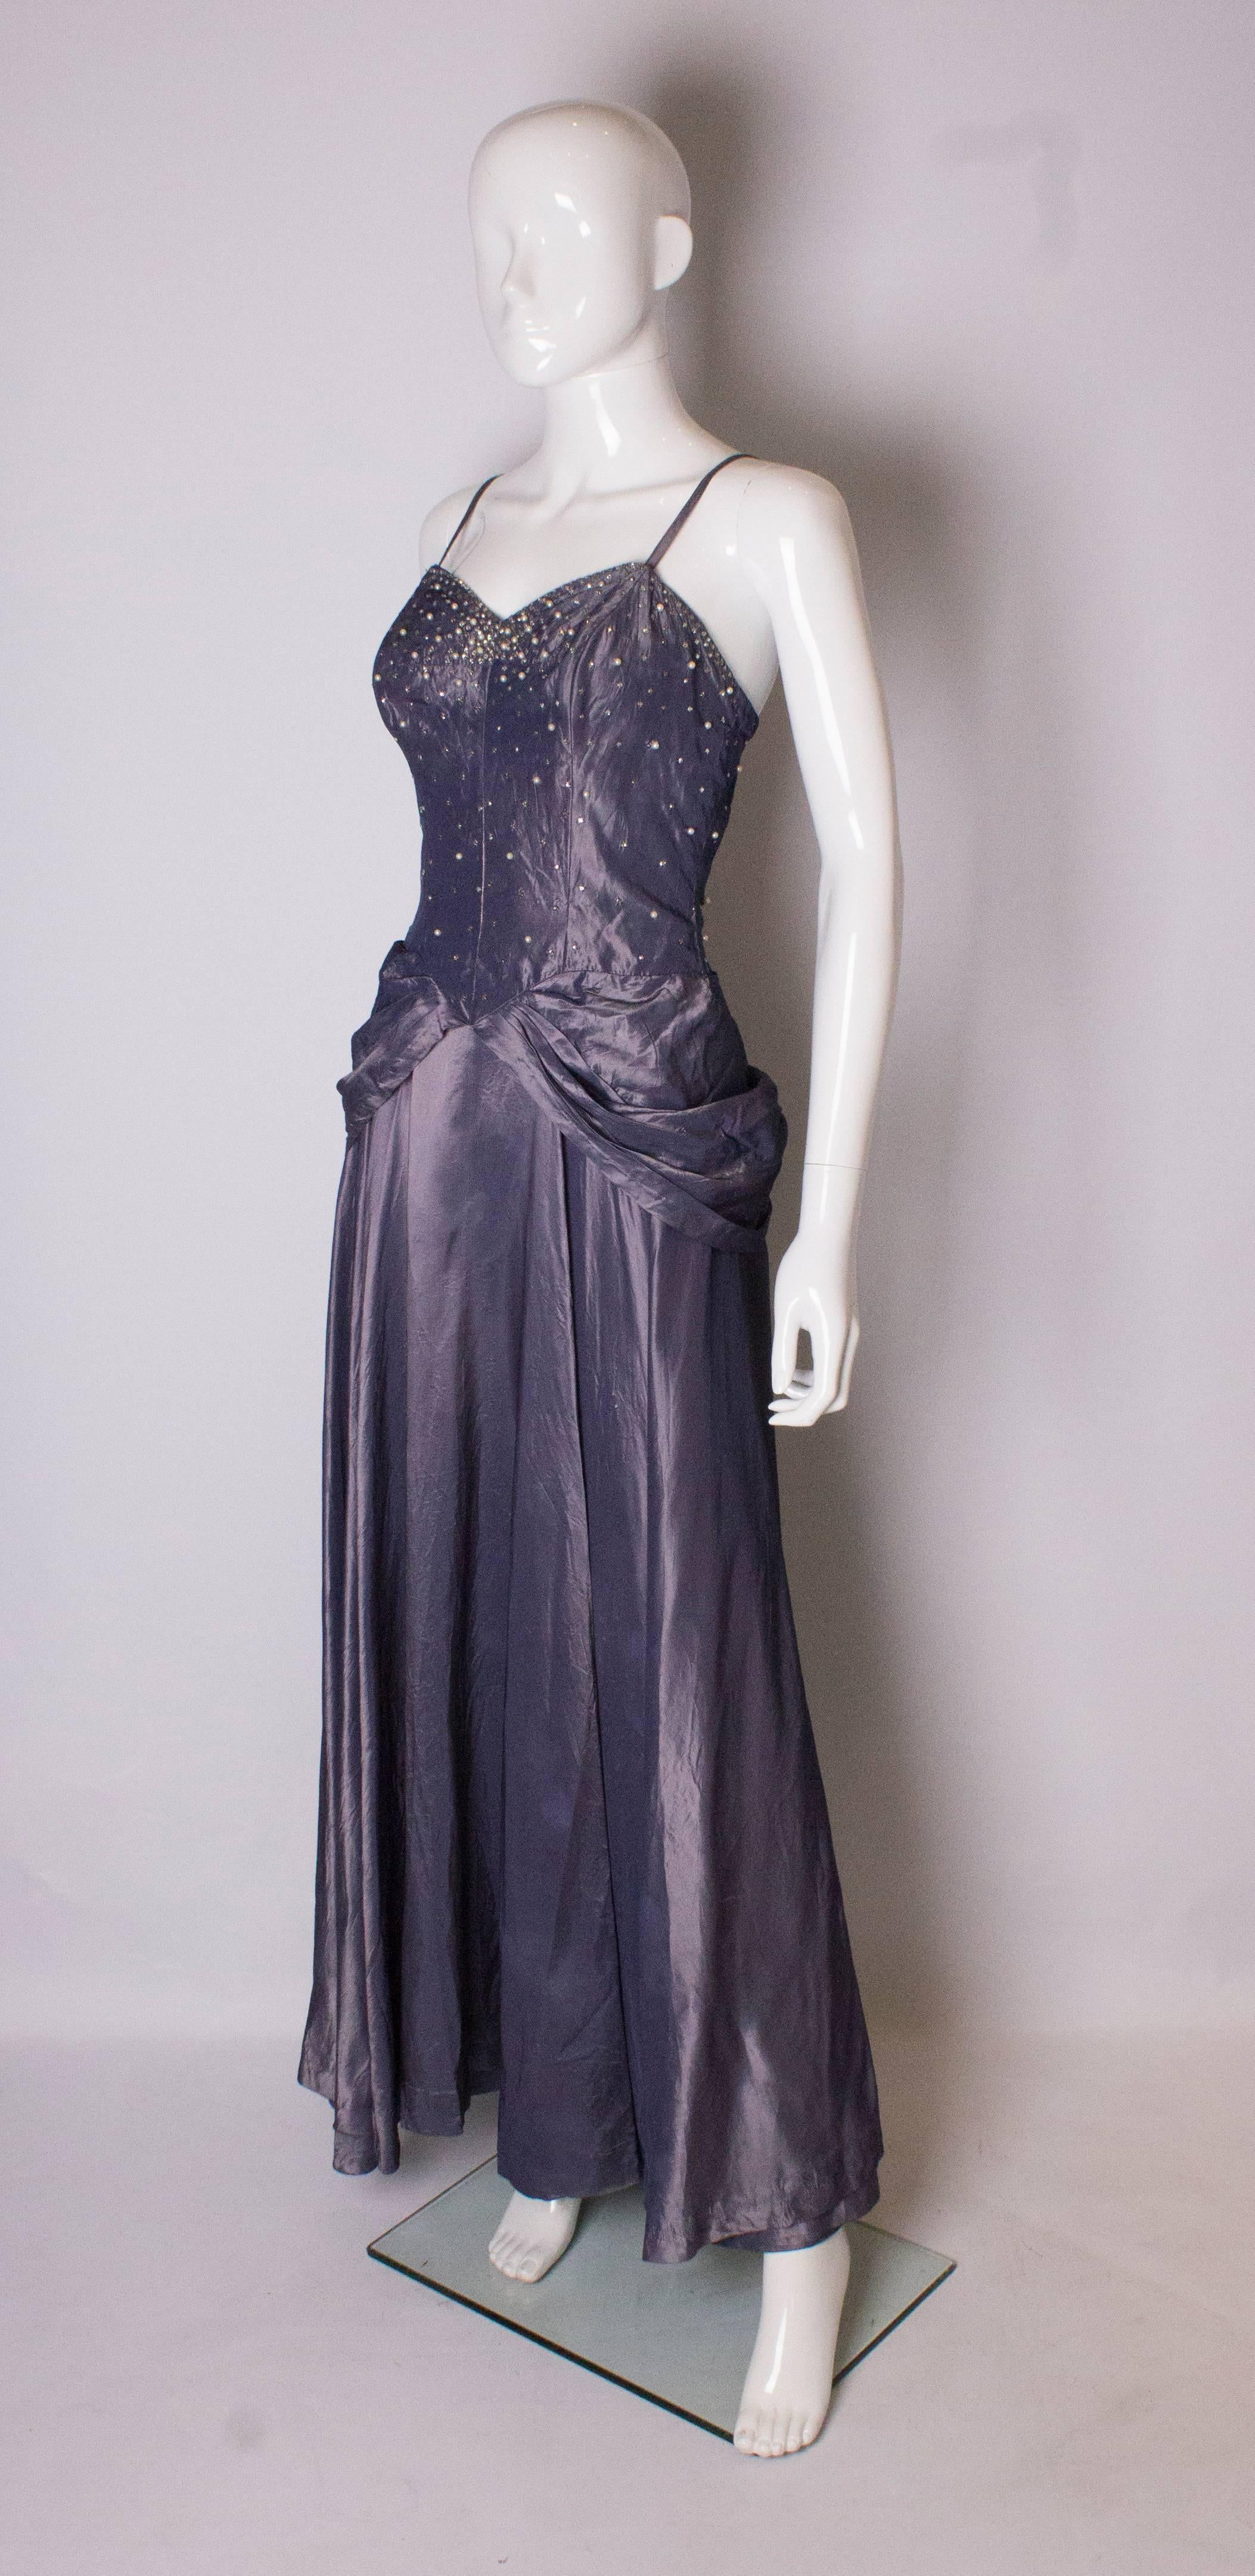 Único Vestidos De Dama 1940 Modelo - Ideas de Vestidos de Boda ...